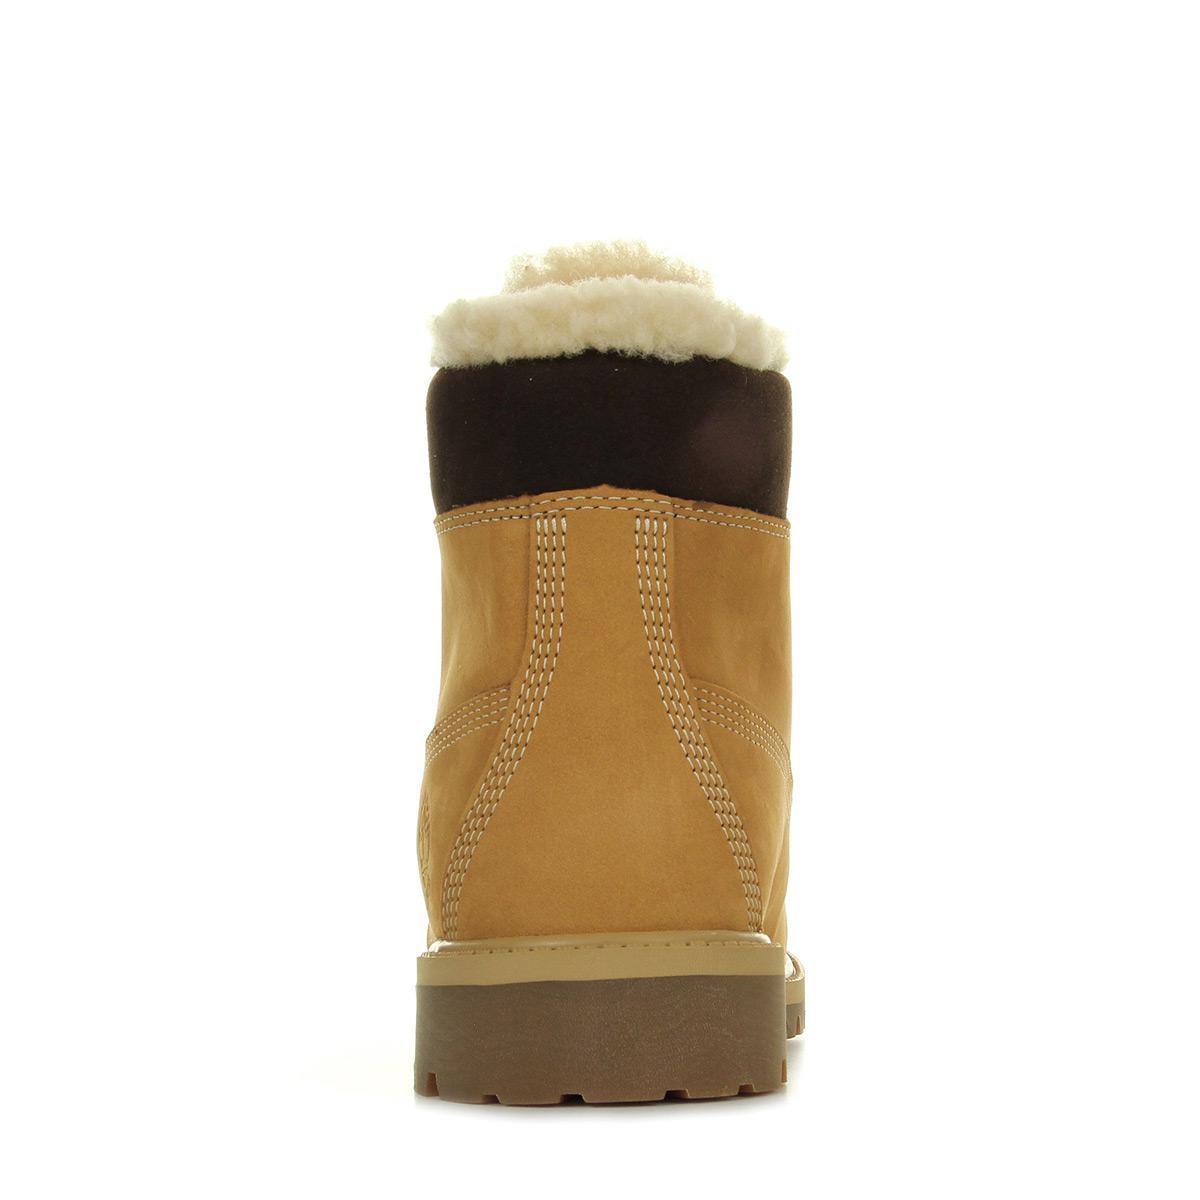 Chaussures 6 In Premium Shearlin Wheat